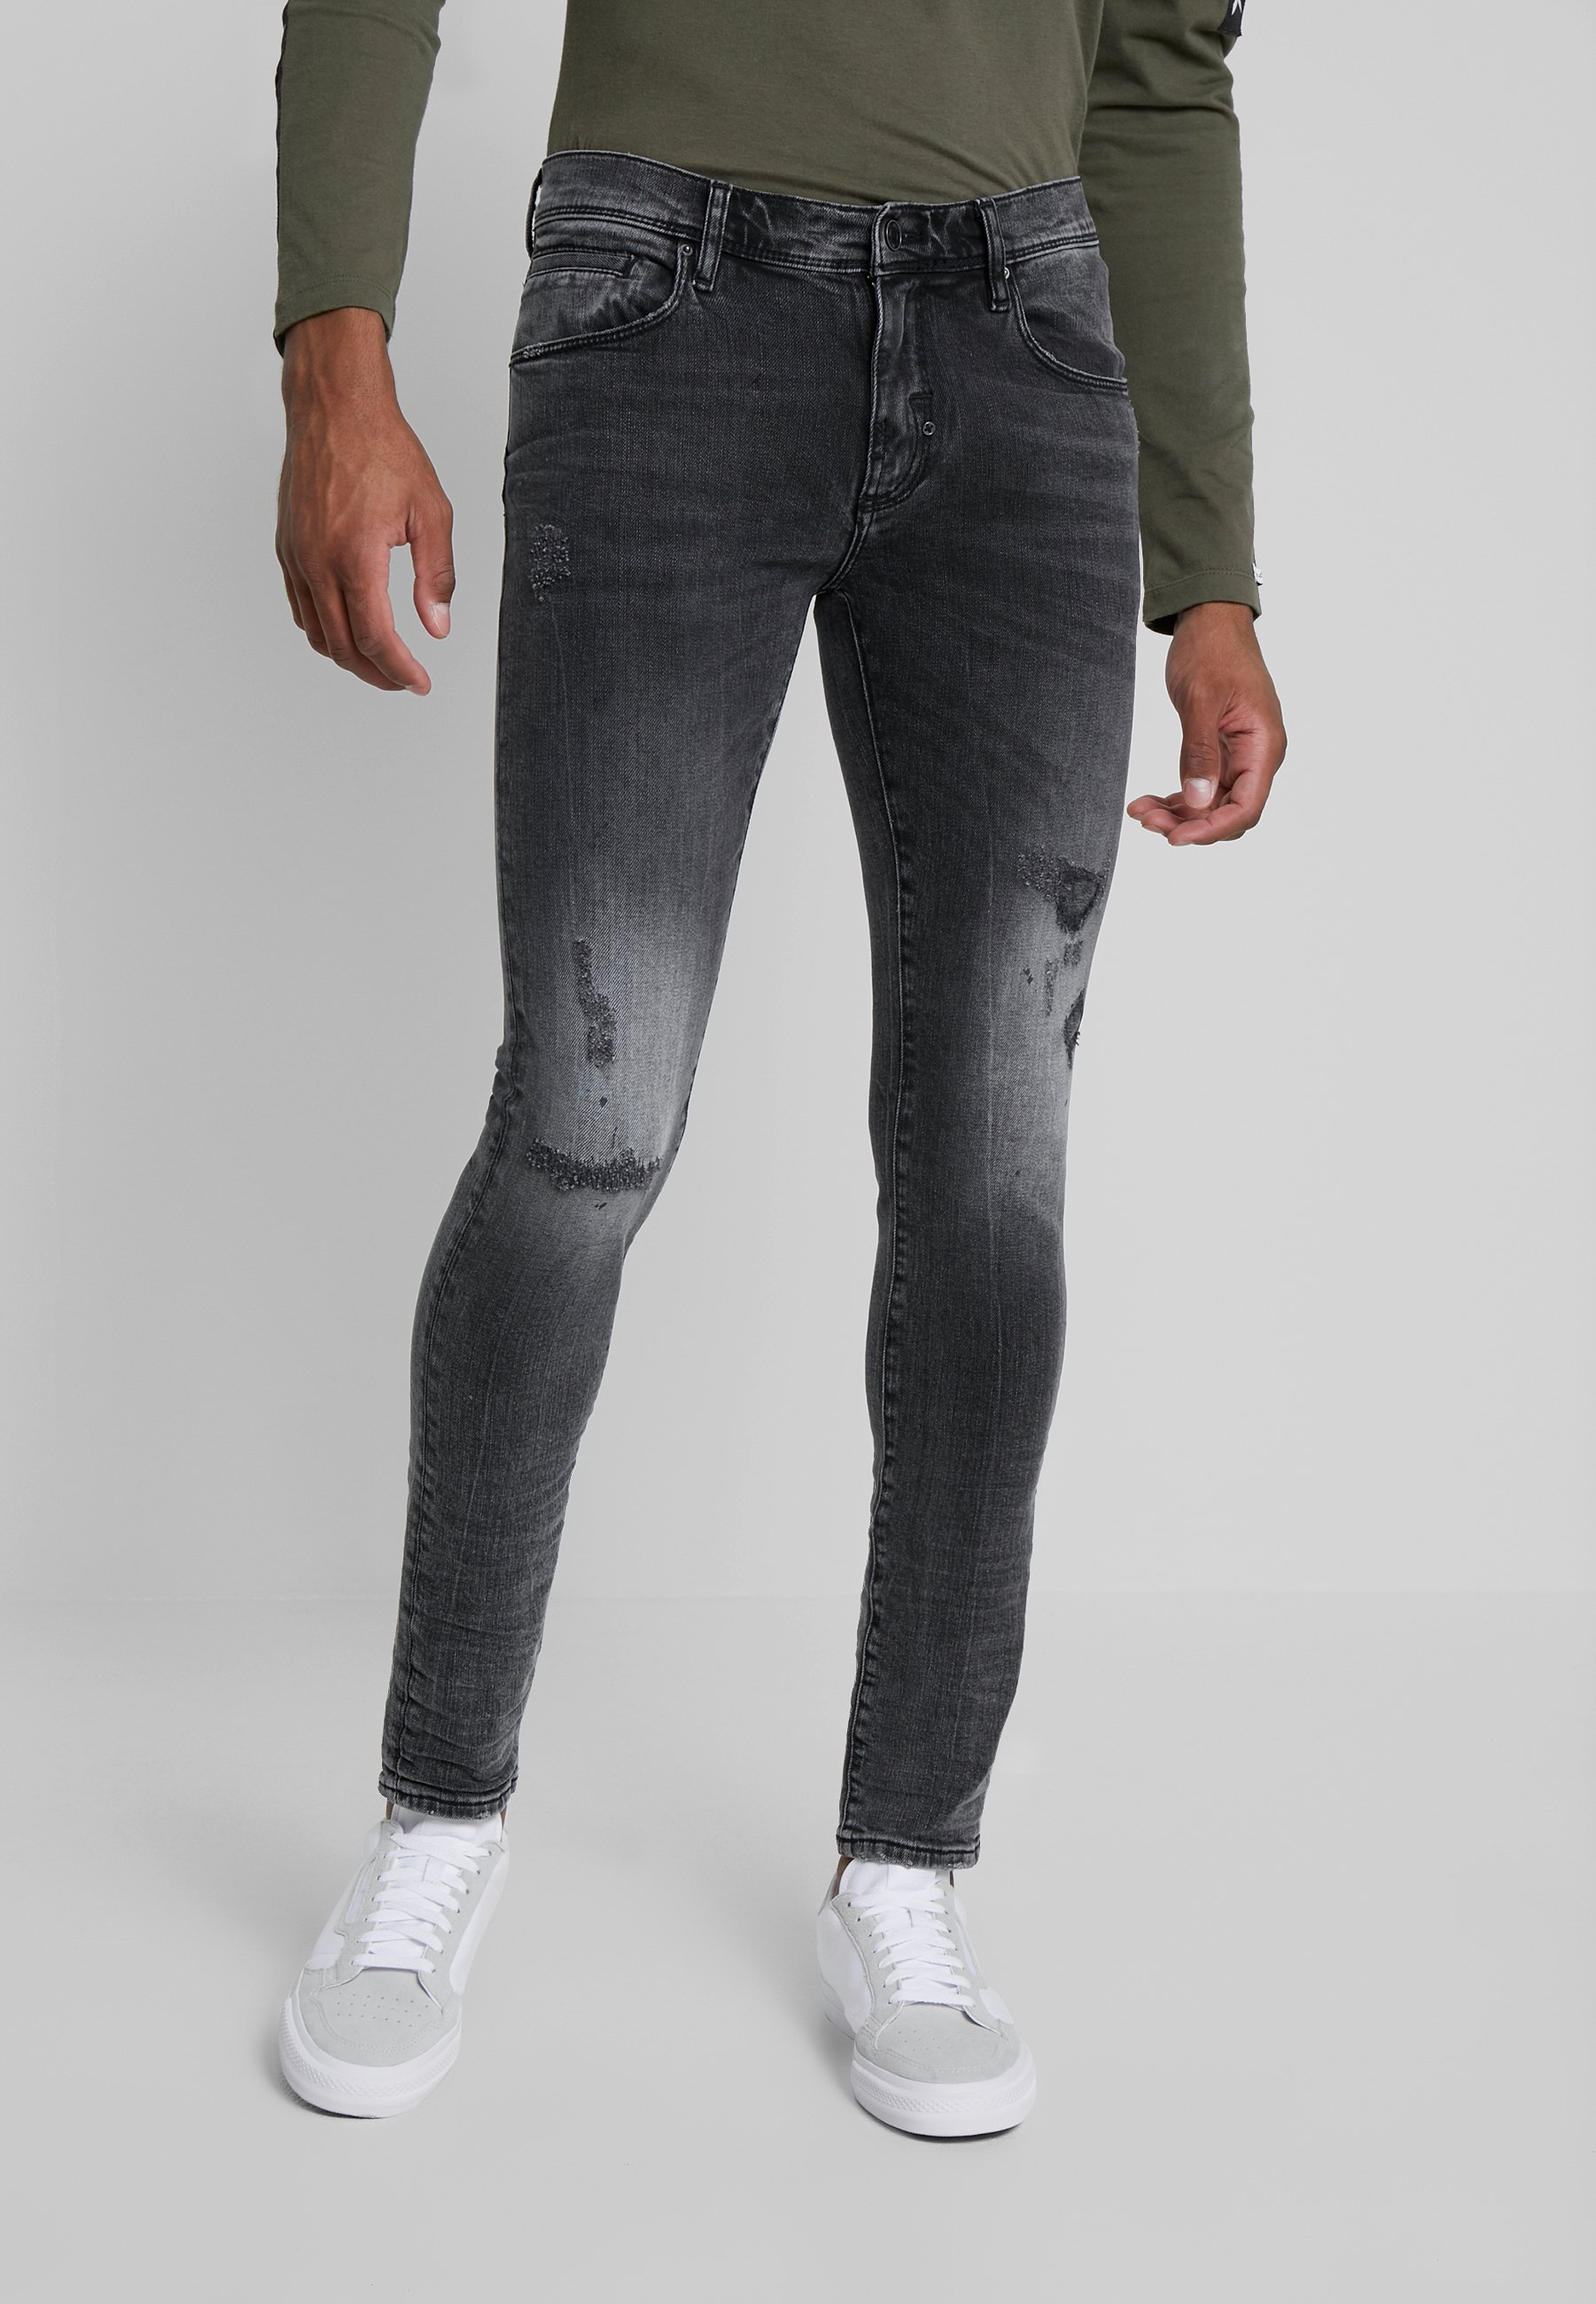 MetalBlack Jeans Morato Antony Barret Skinny b7Y6ygf